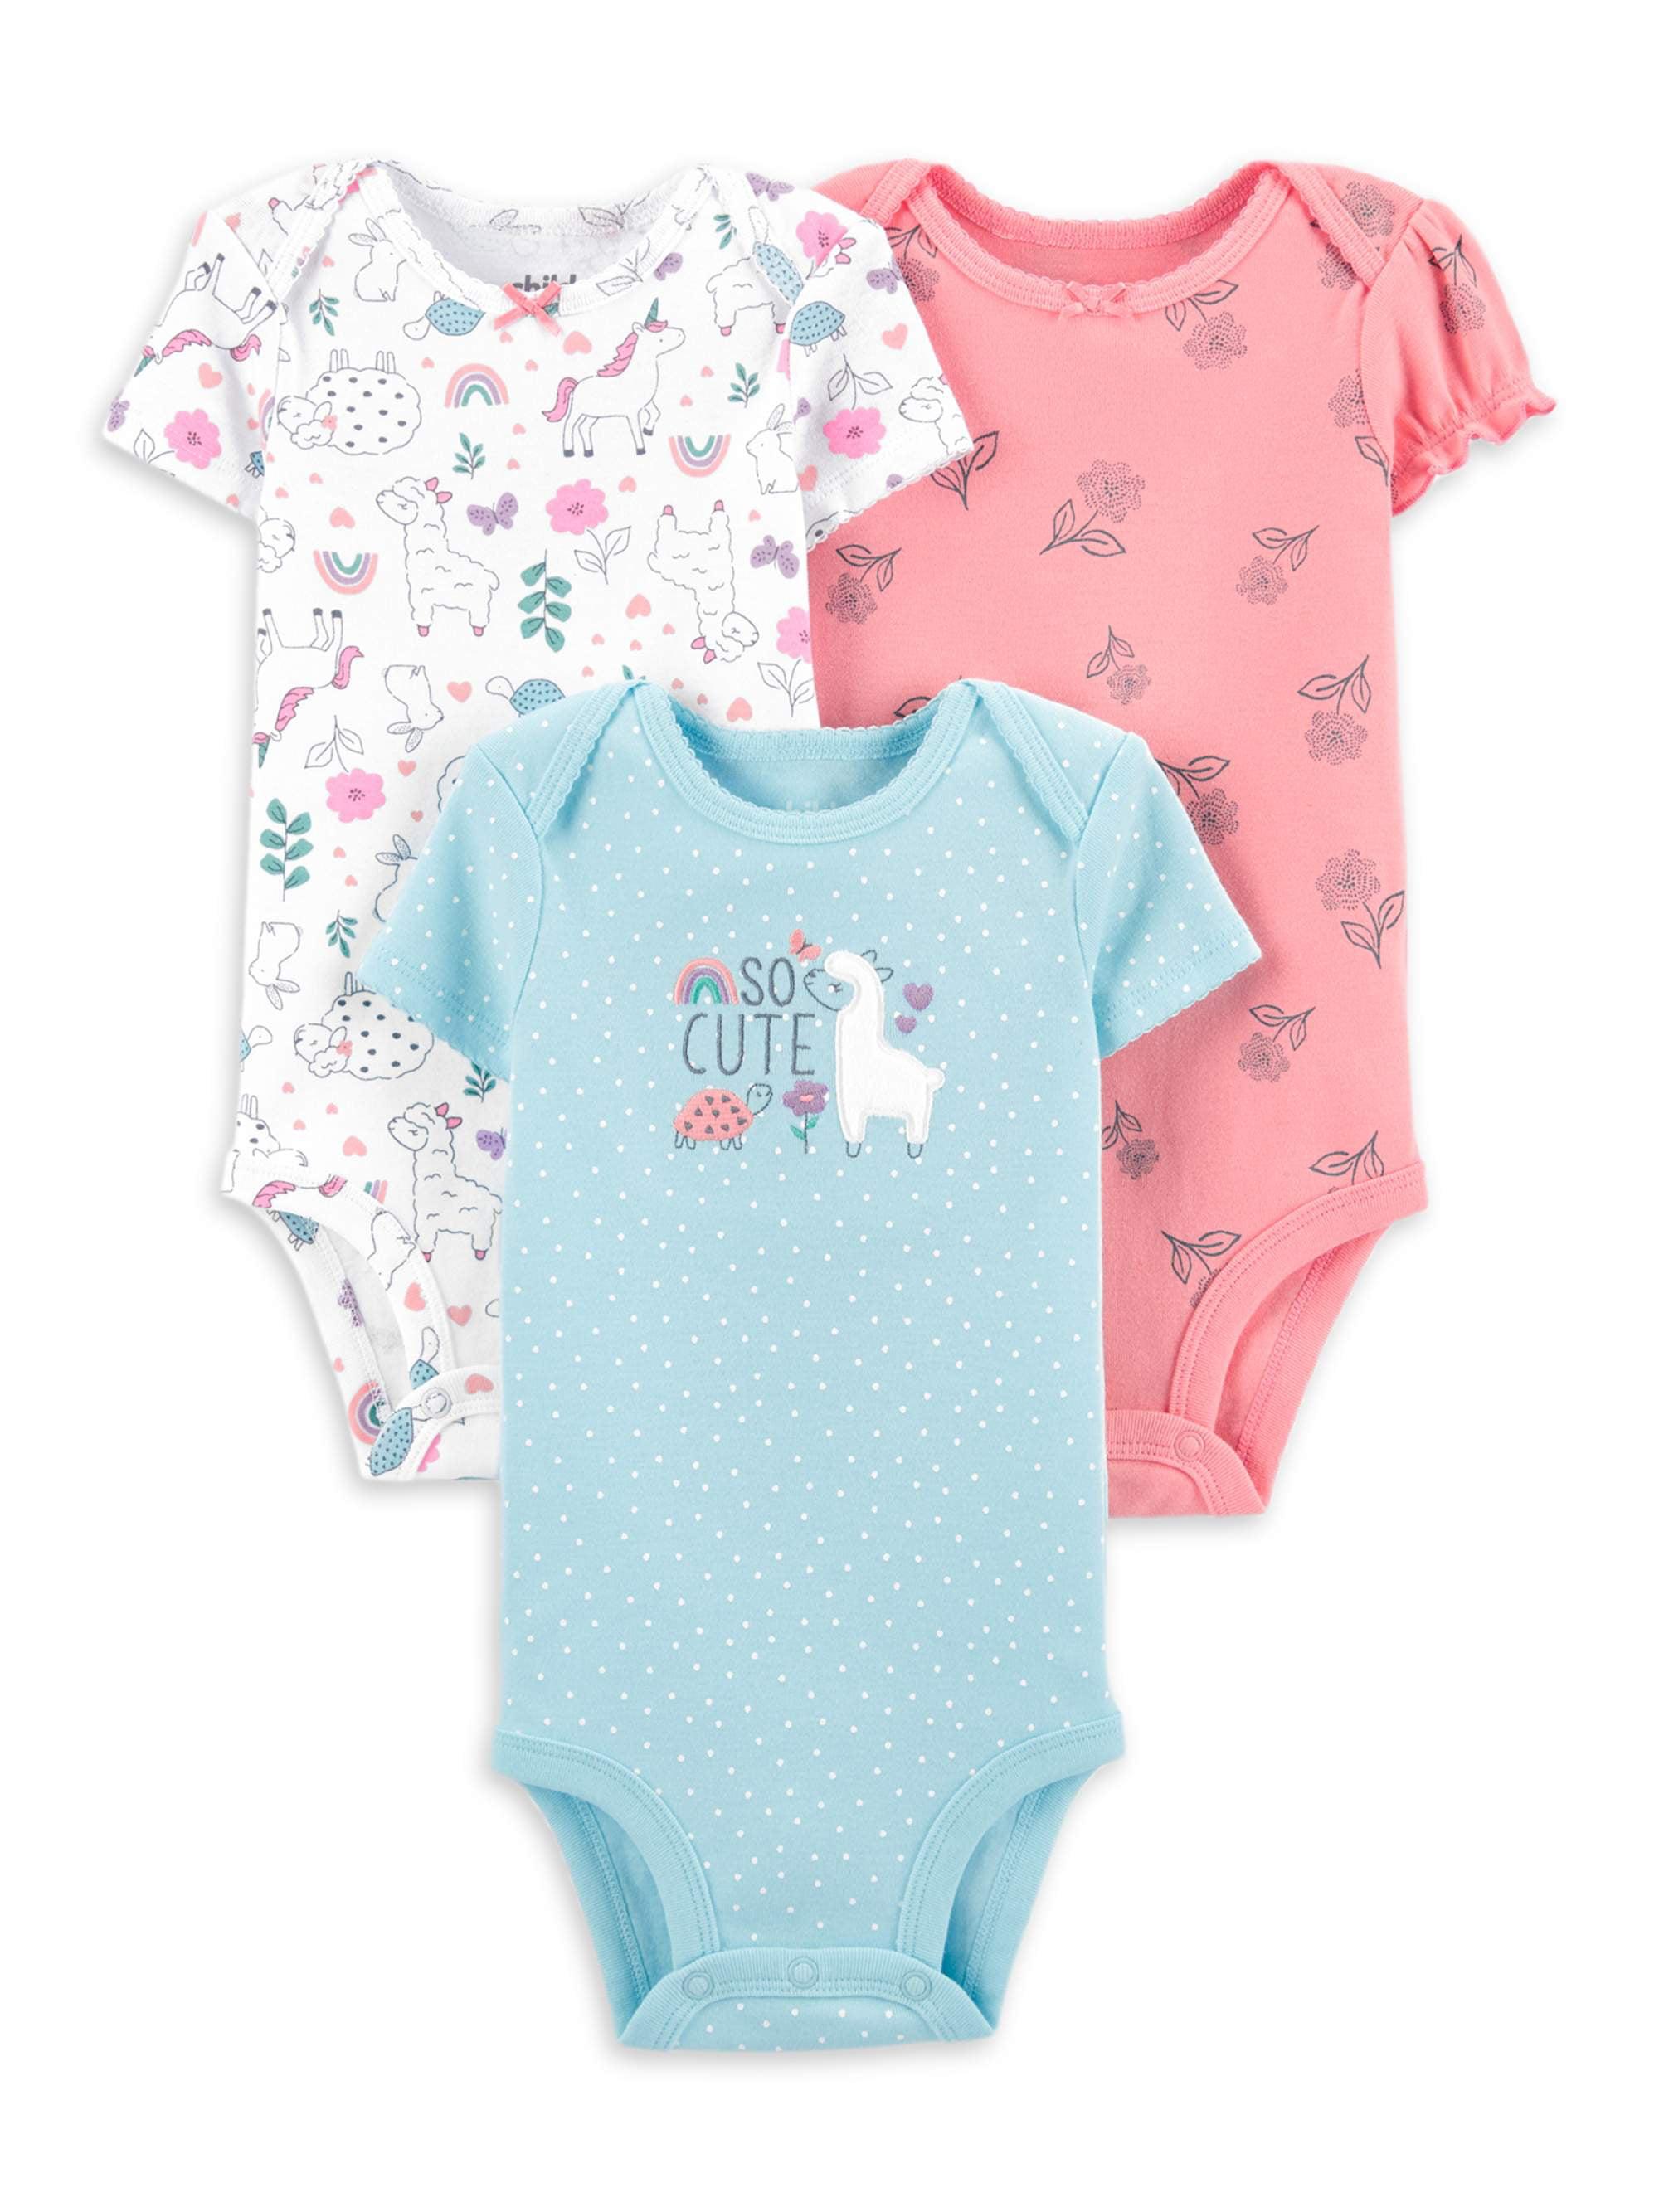 Child of Mine Carters Short Sleeve Bodysuits 3 pack Girls Preemie NB 0-3 M Pink